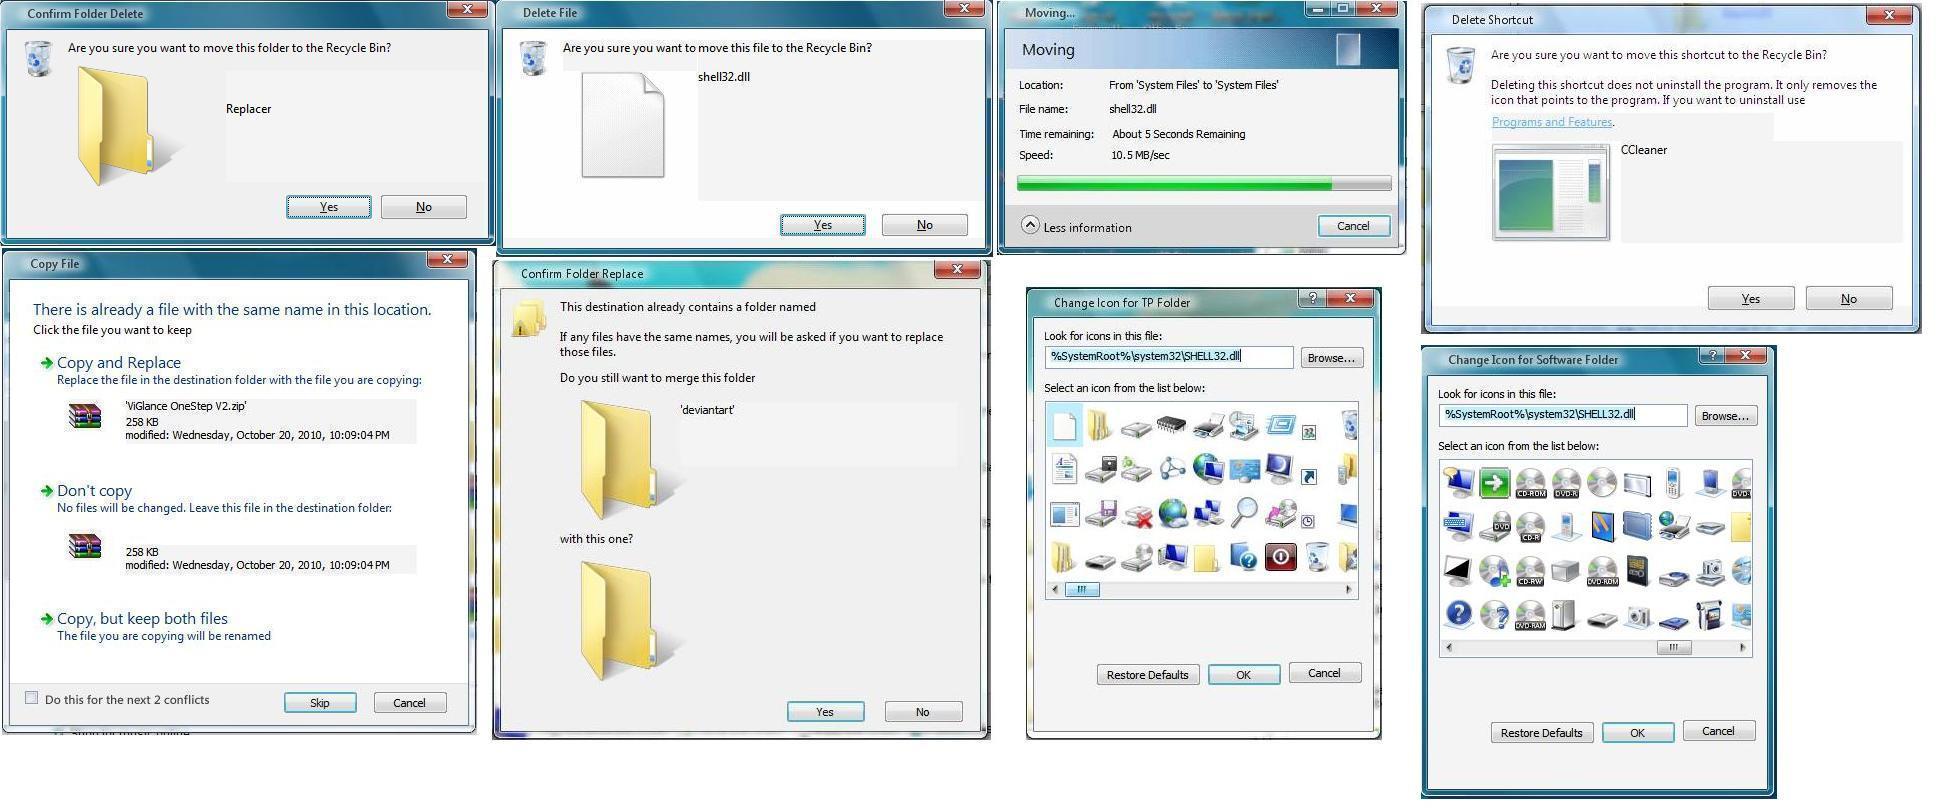 Shell32 dll xp mod 7 perfect by dark knight193